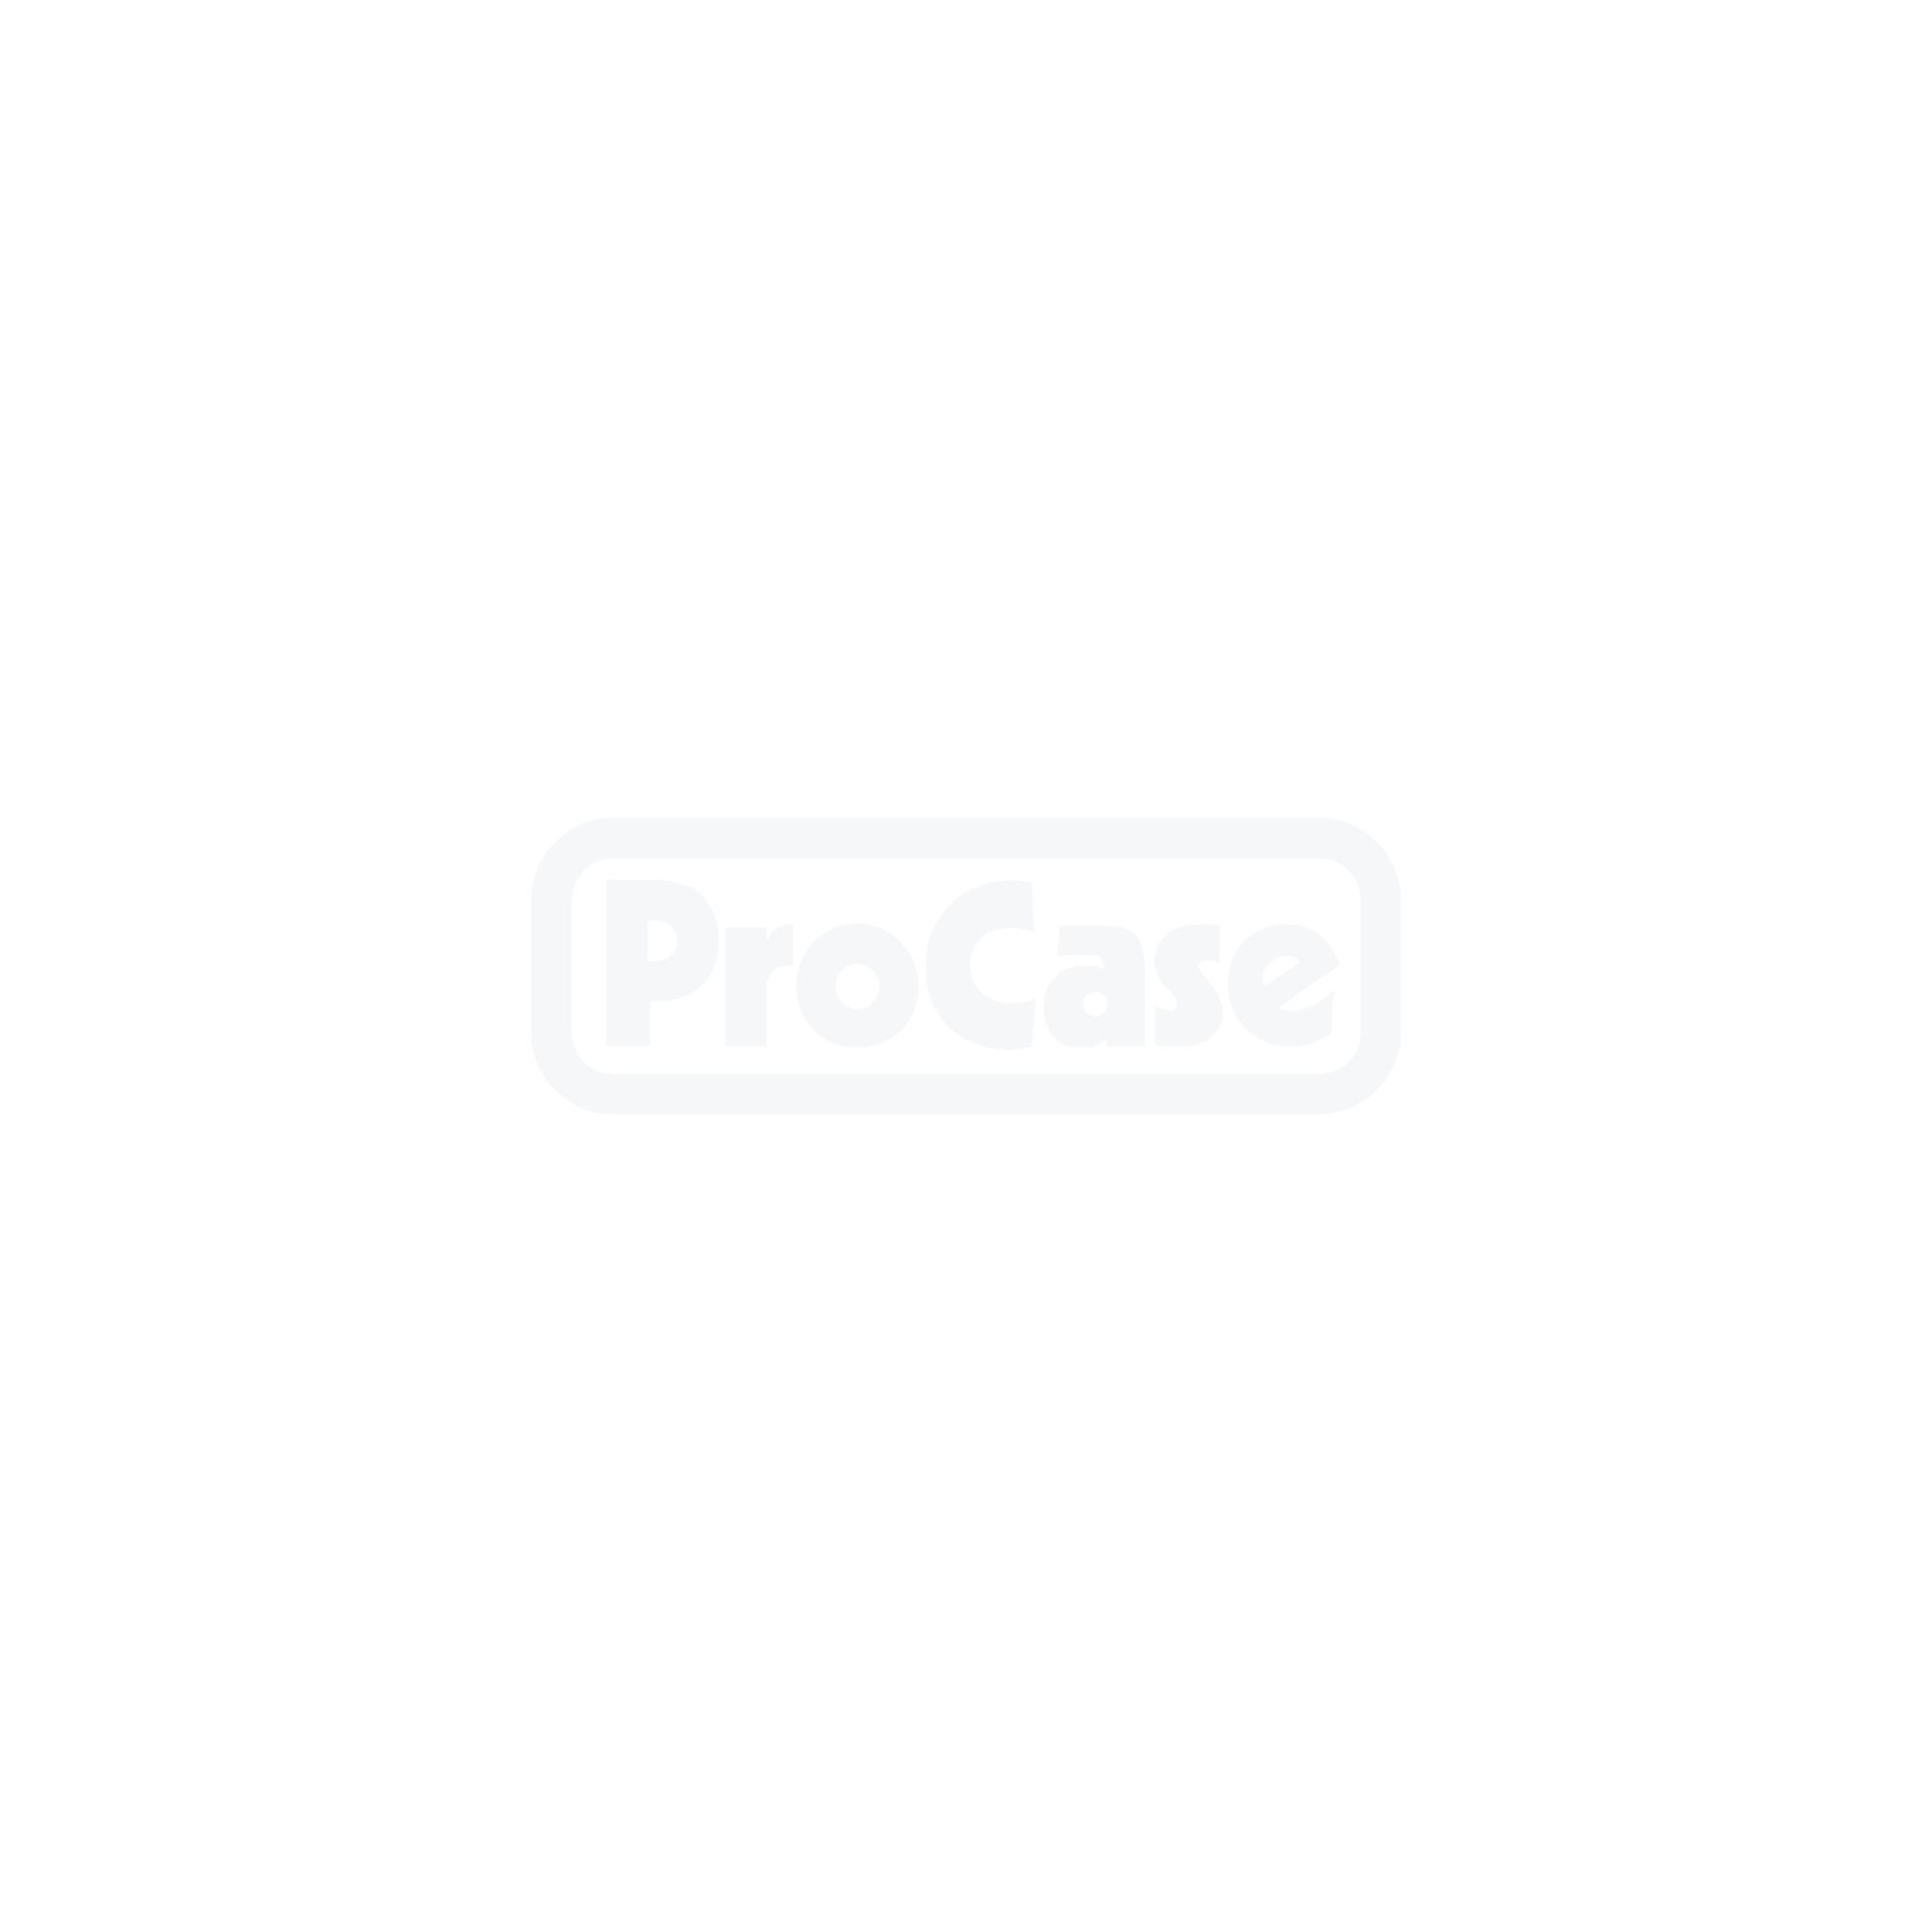 SKB 3i Koffer 1610-5B mit Rasterschaumstoff